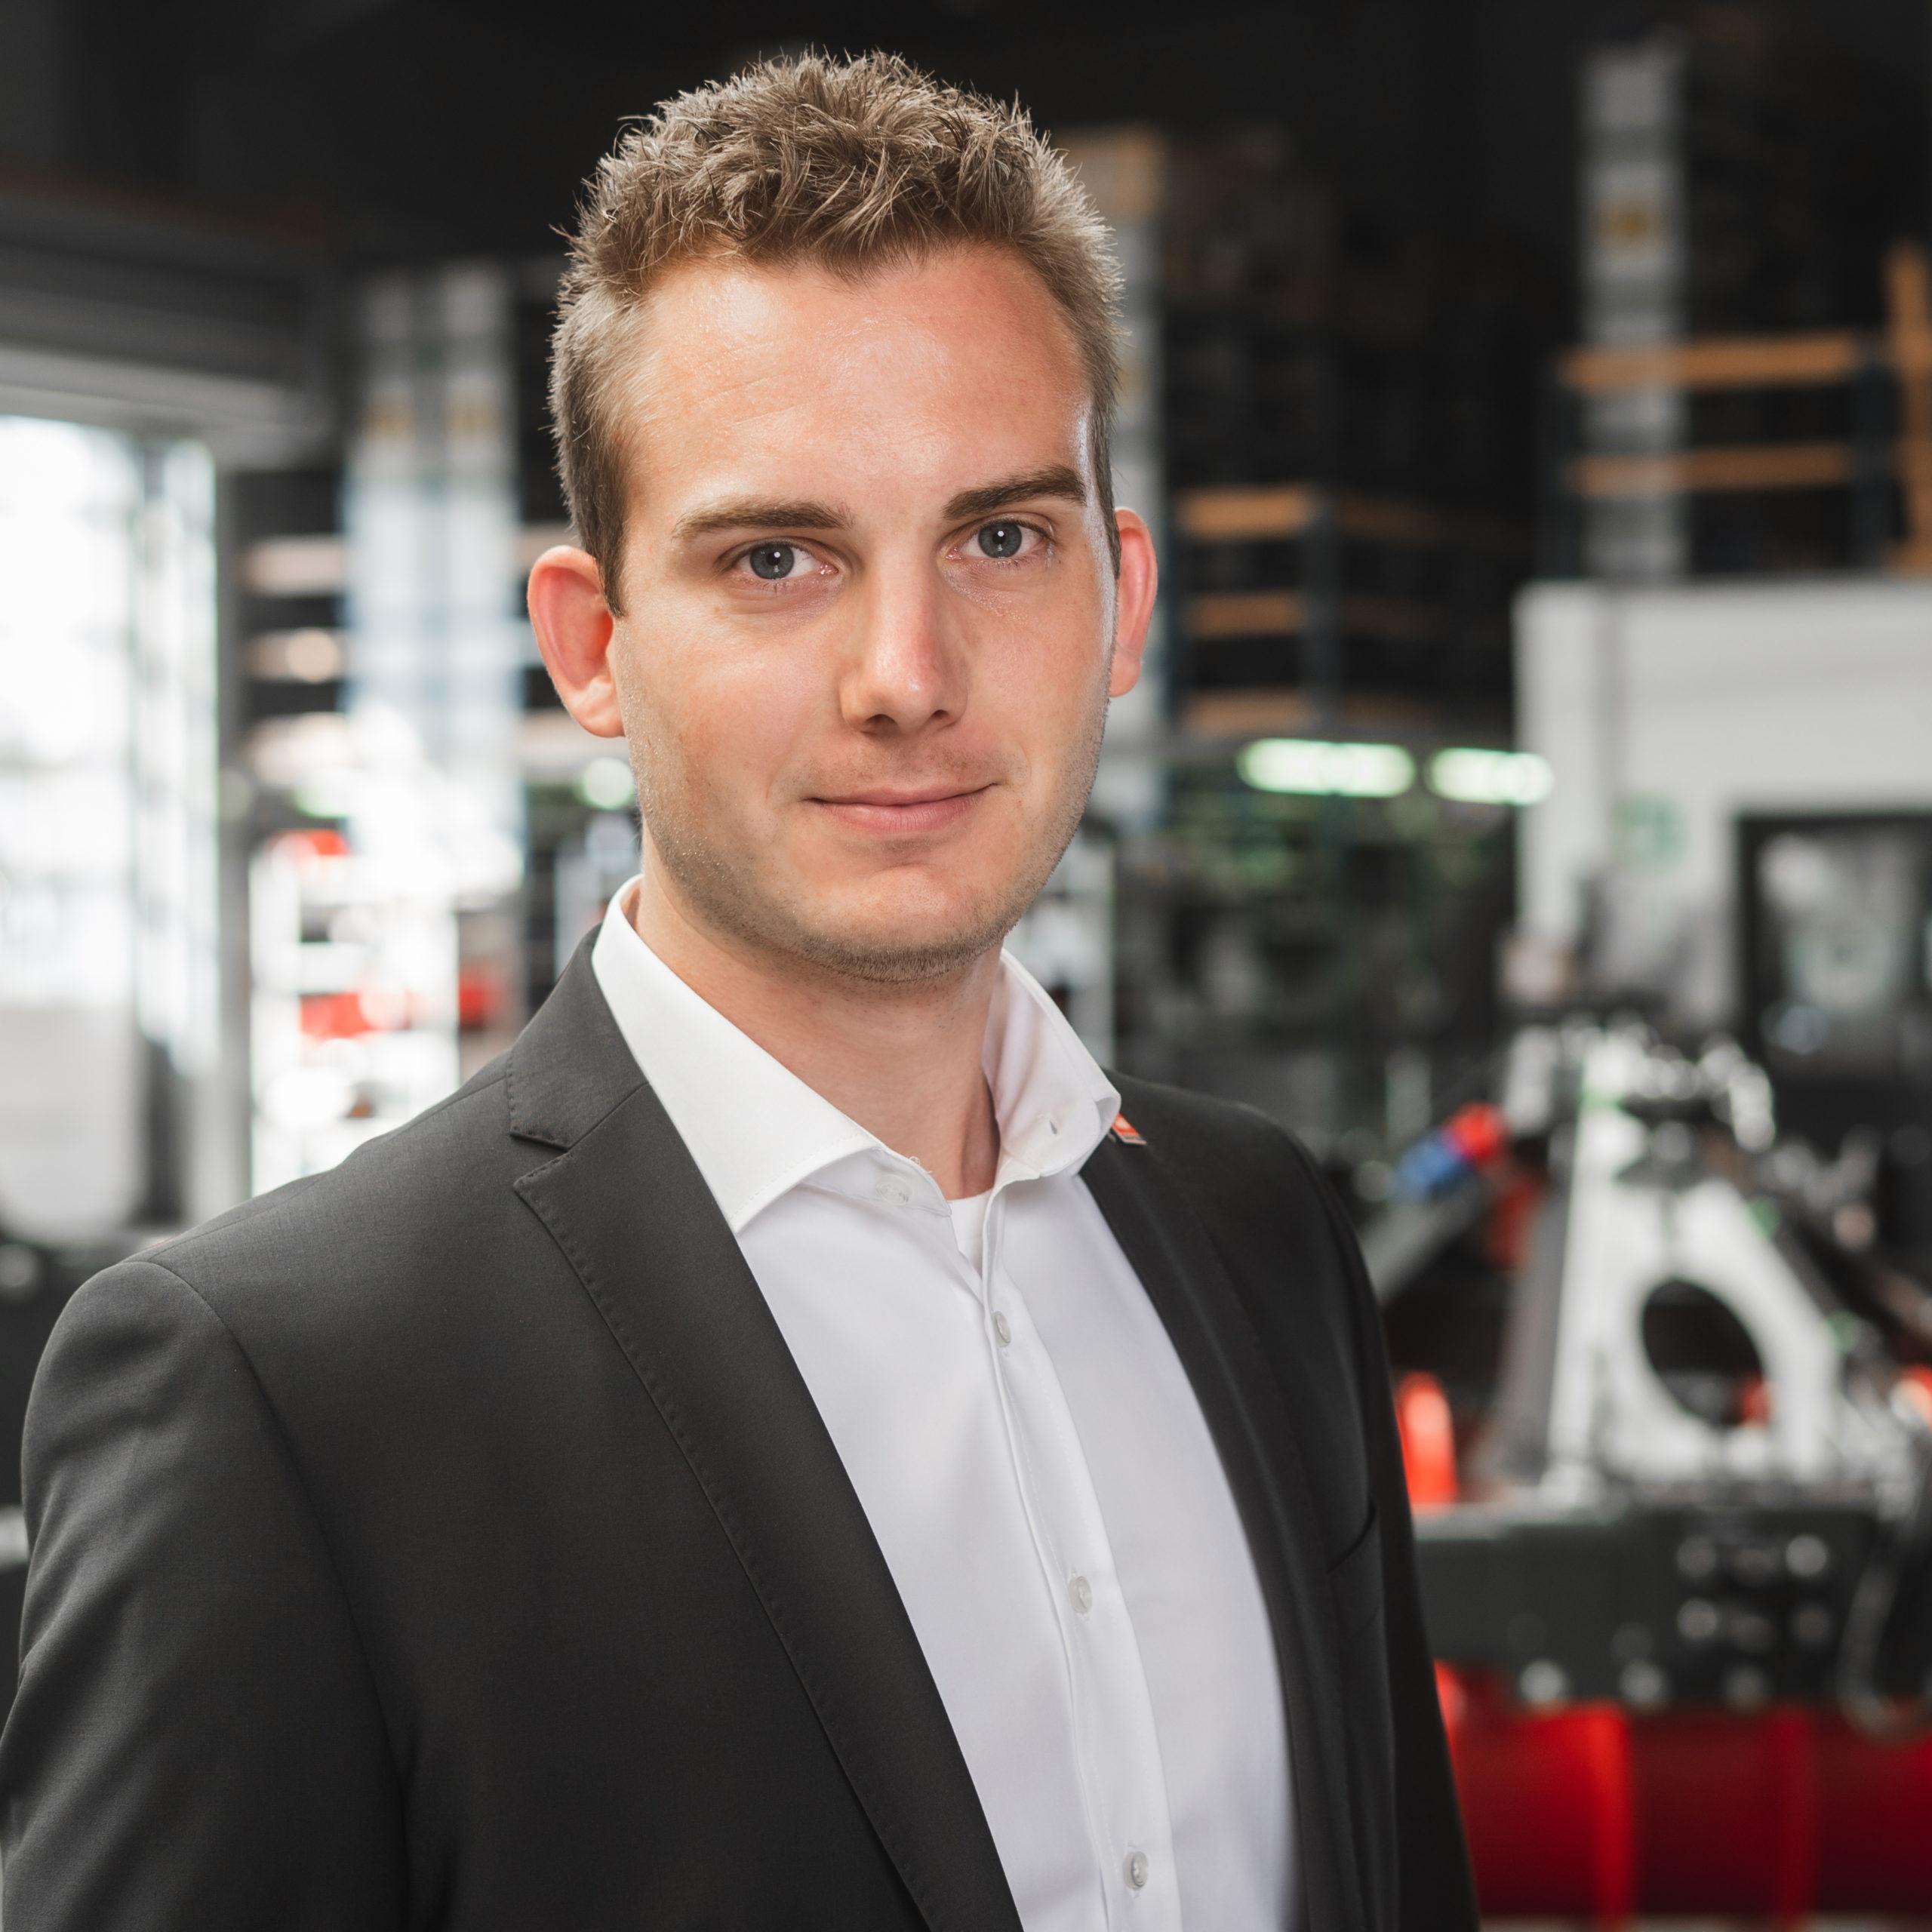 Jens Mulsow